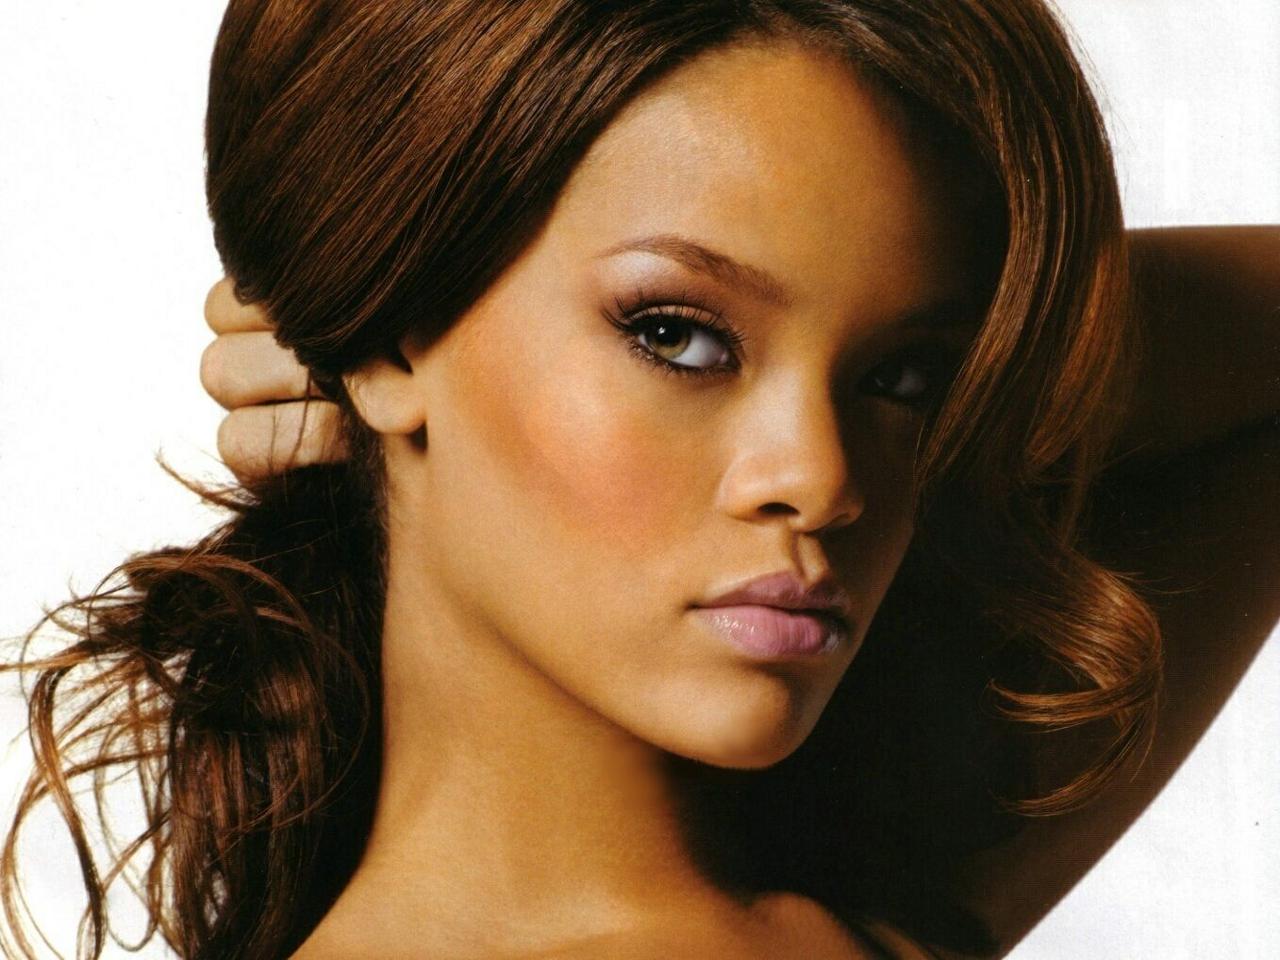 Pop Singer Rihanna photo